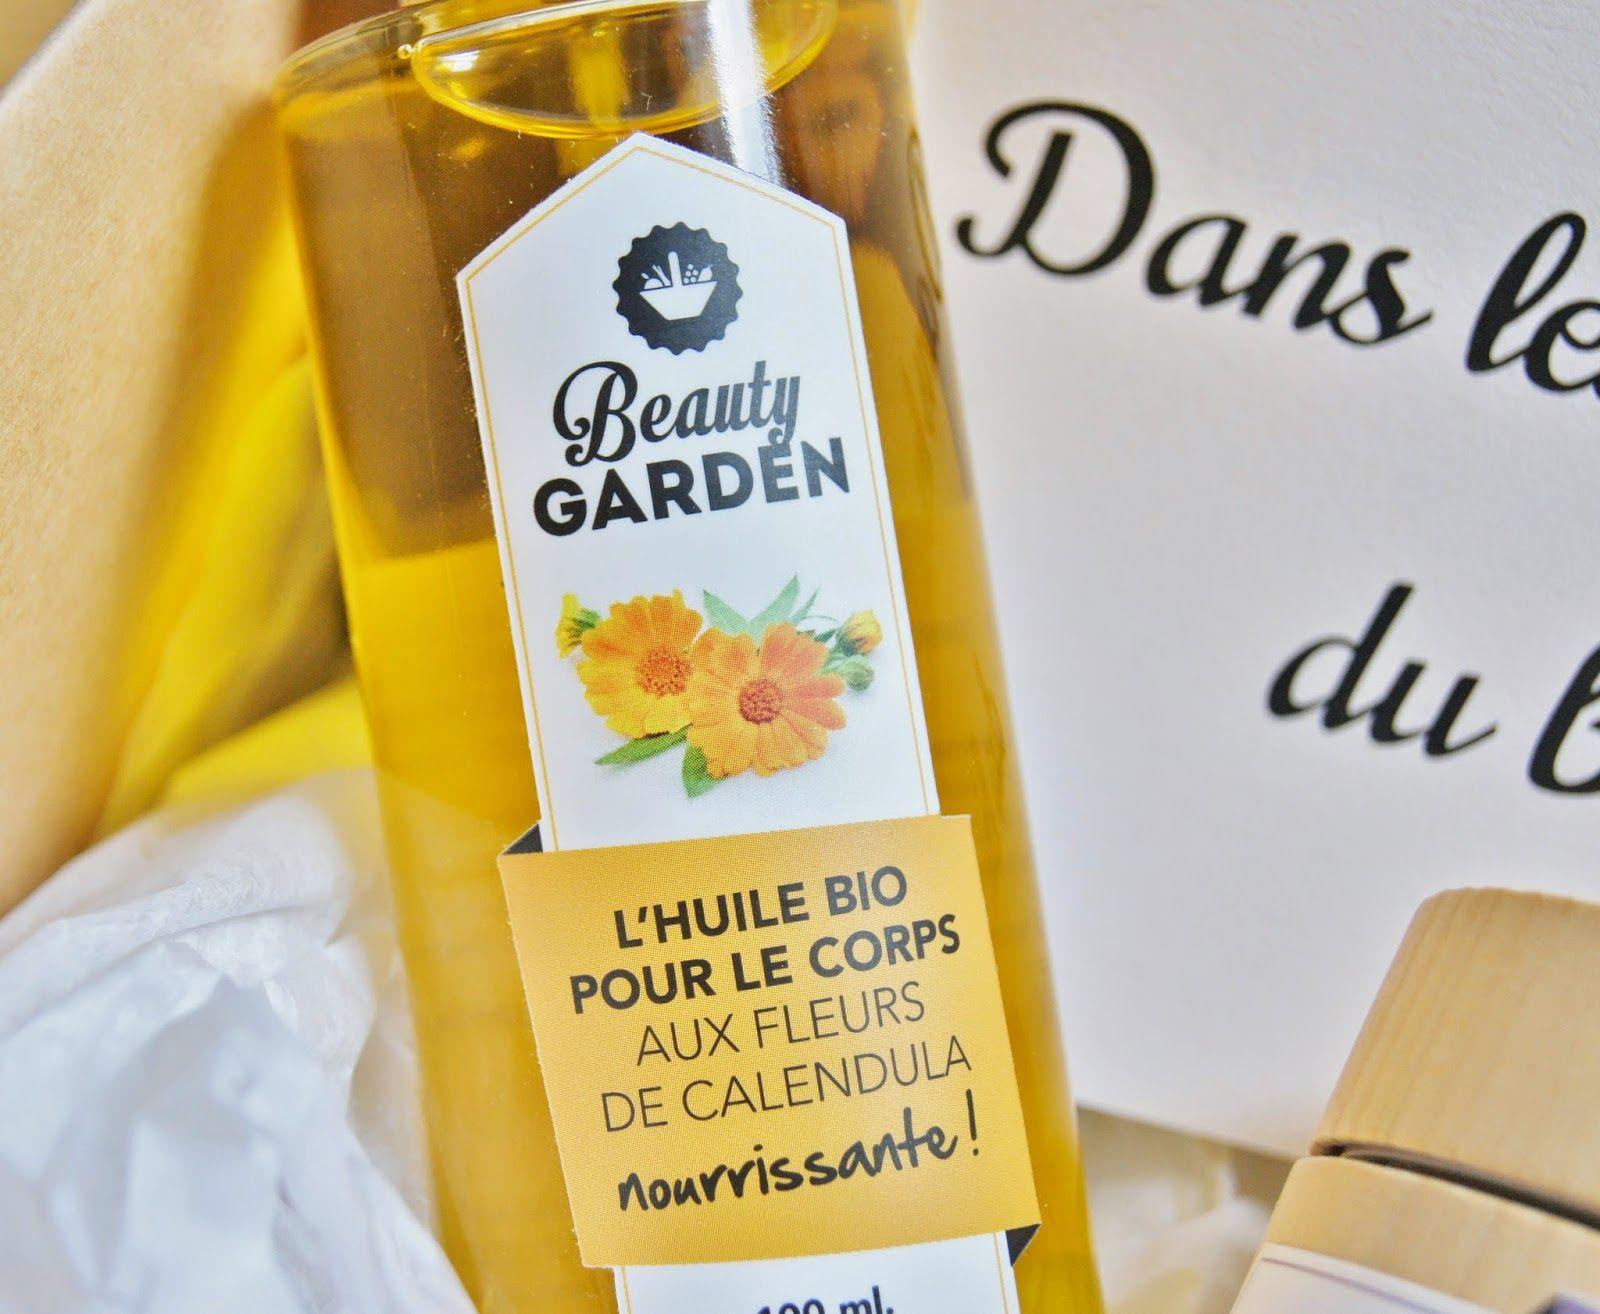 Huile bio nourrissante au calendula de Beauty Garden sur la jolie photo de @ninilachipie #skincare #calendula